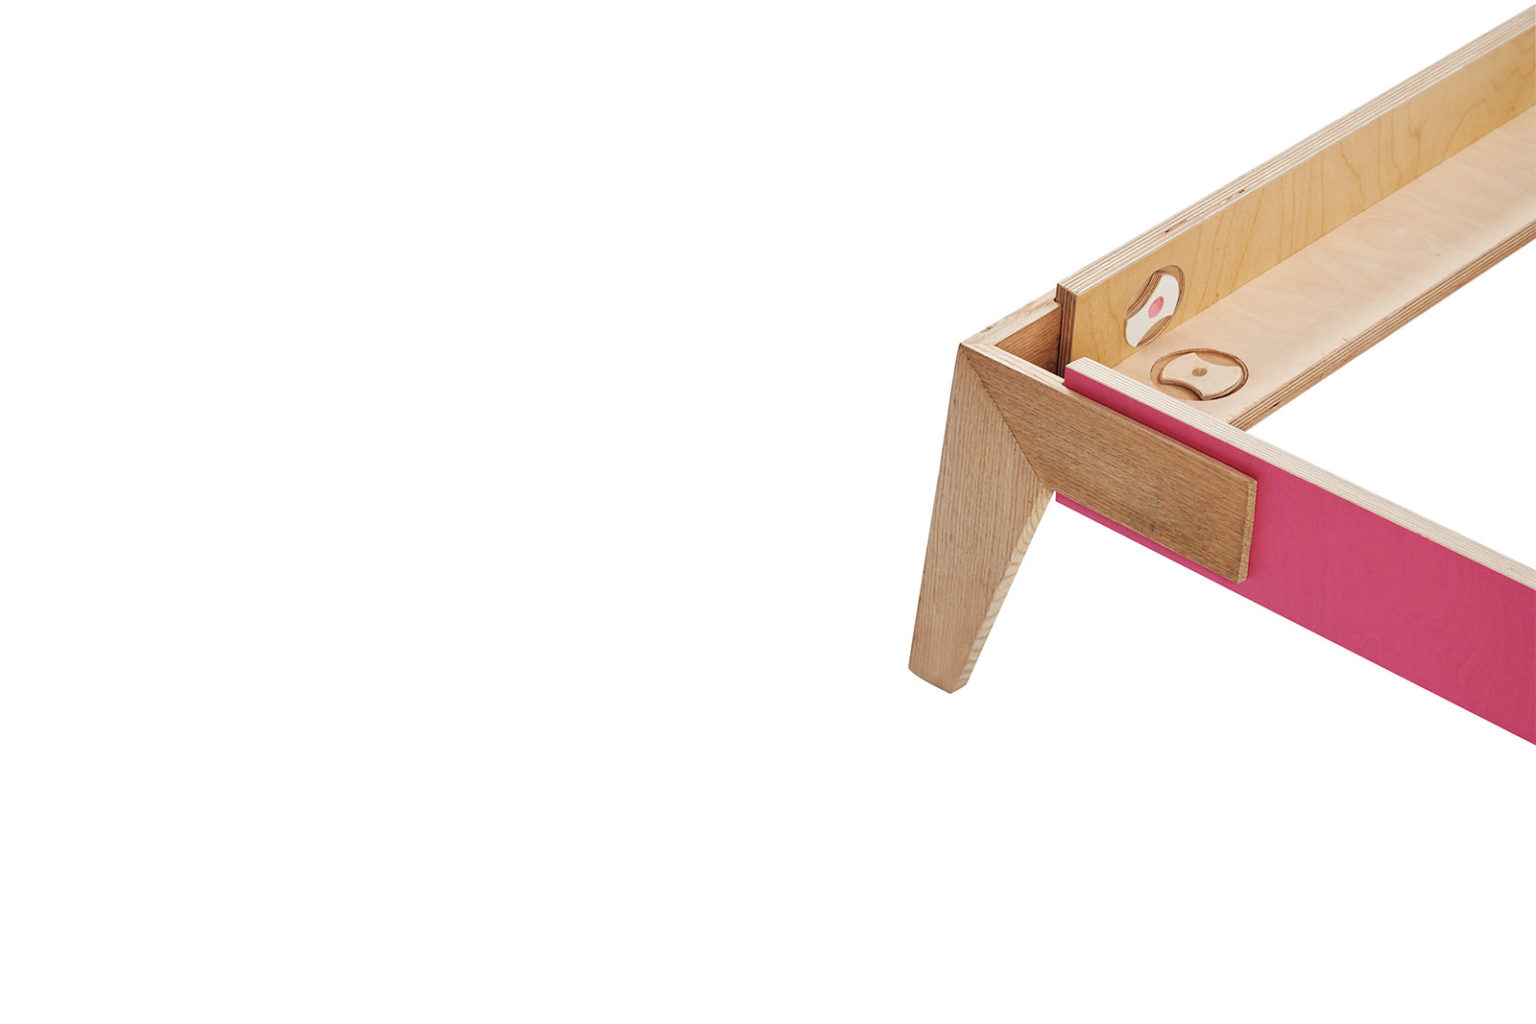 _0005_4.12 ei-pink Shift Bed_c